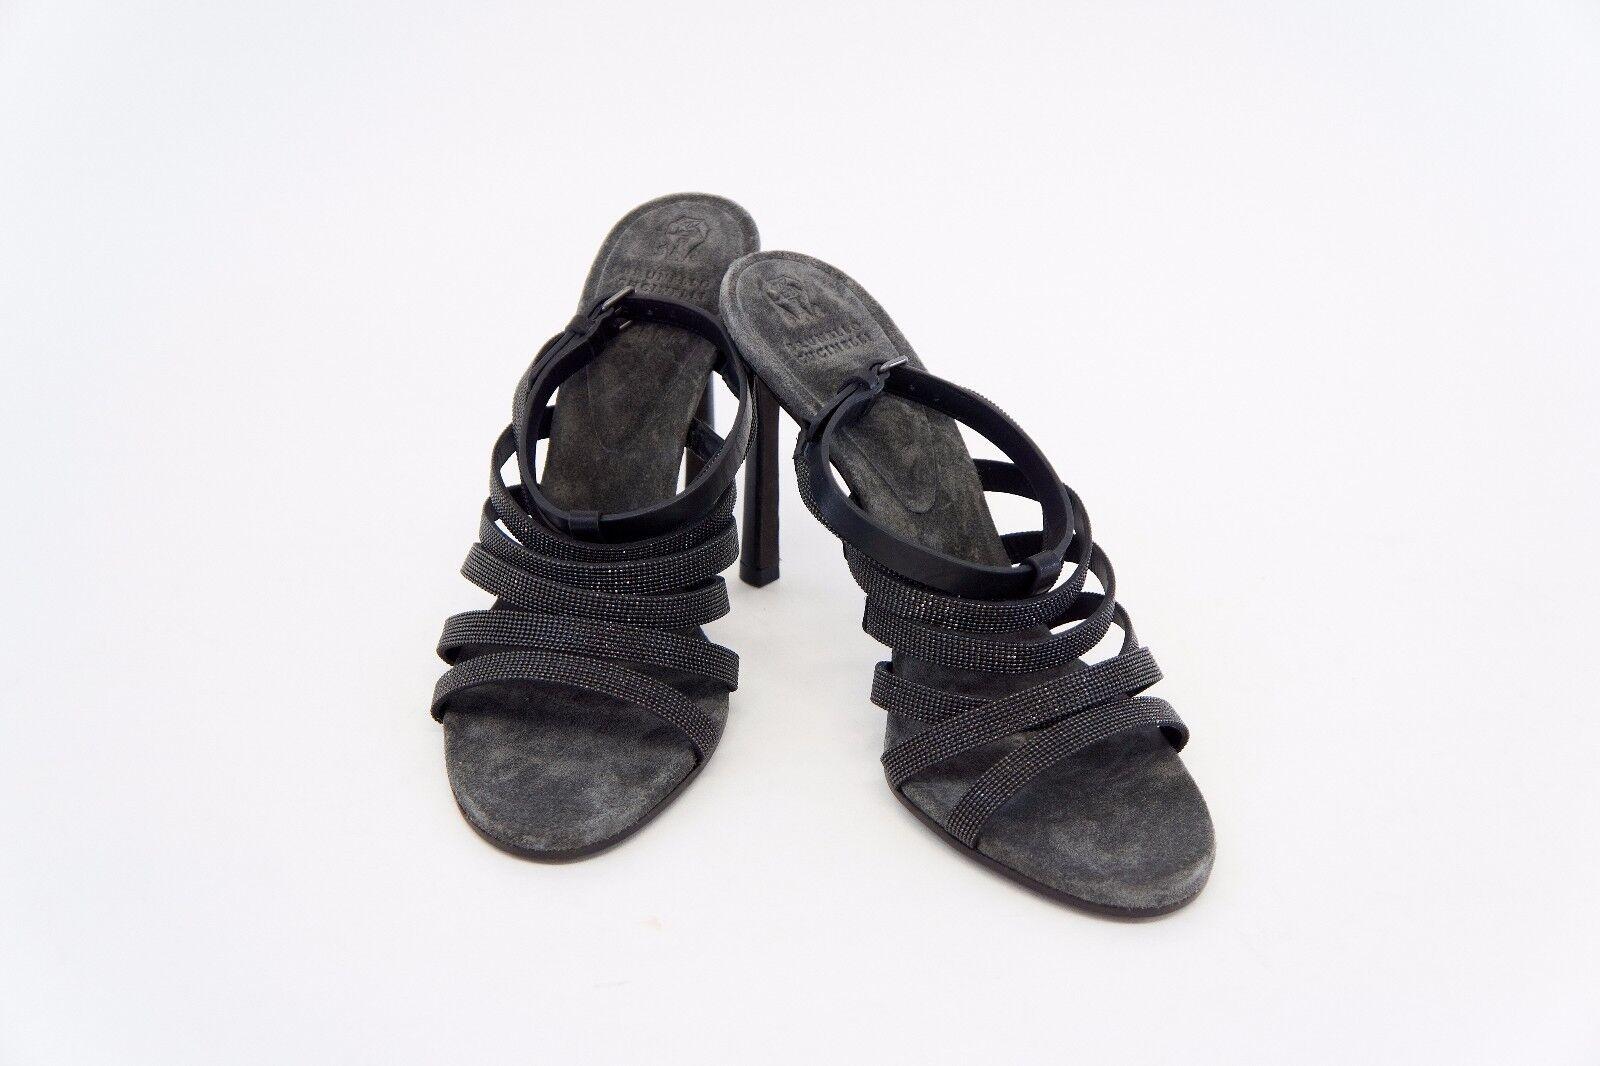 NWOB  1695 Brunello Cucinelli 100% Leather Monili Strap Beaded Sandals 37 7 A176